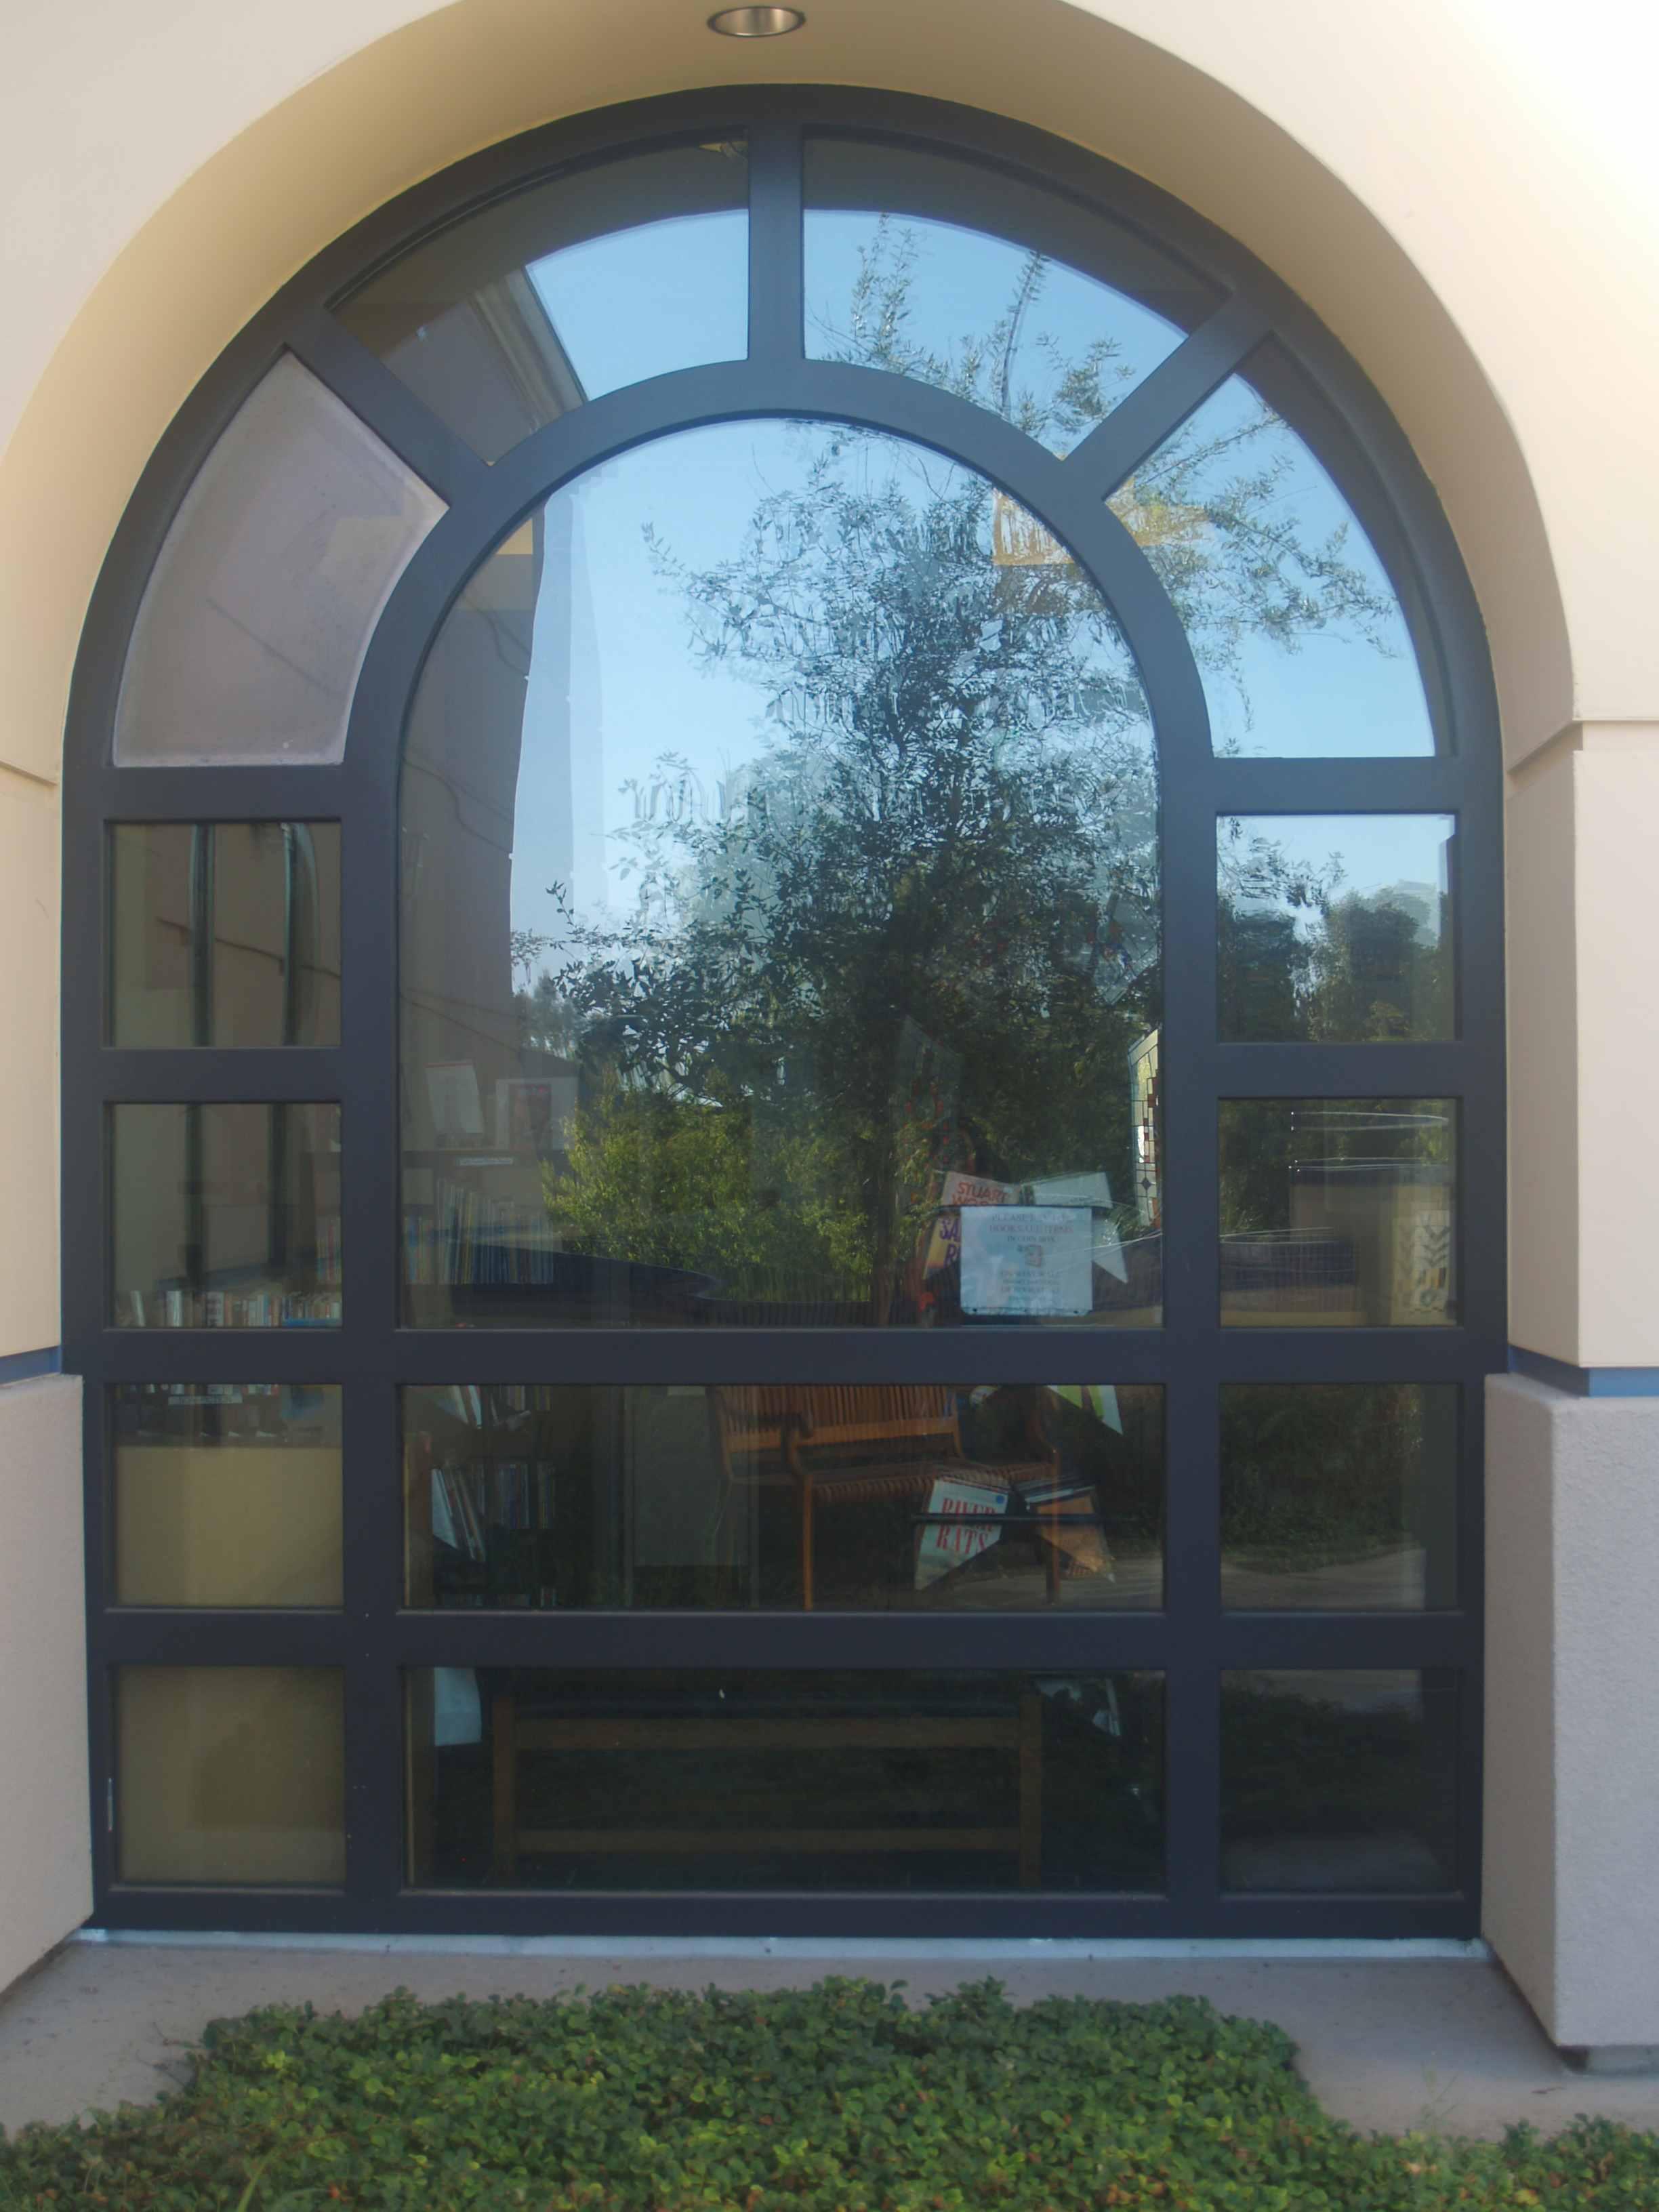 Serra Mesa library, San Diego County